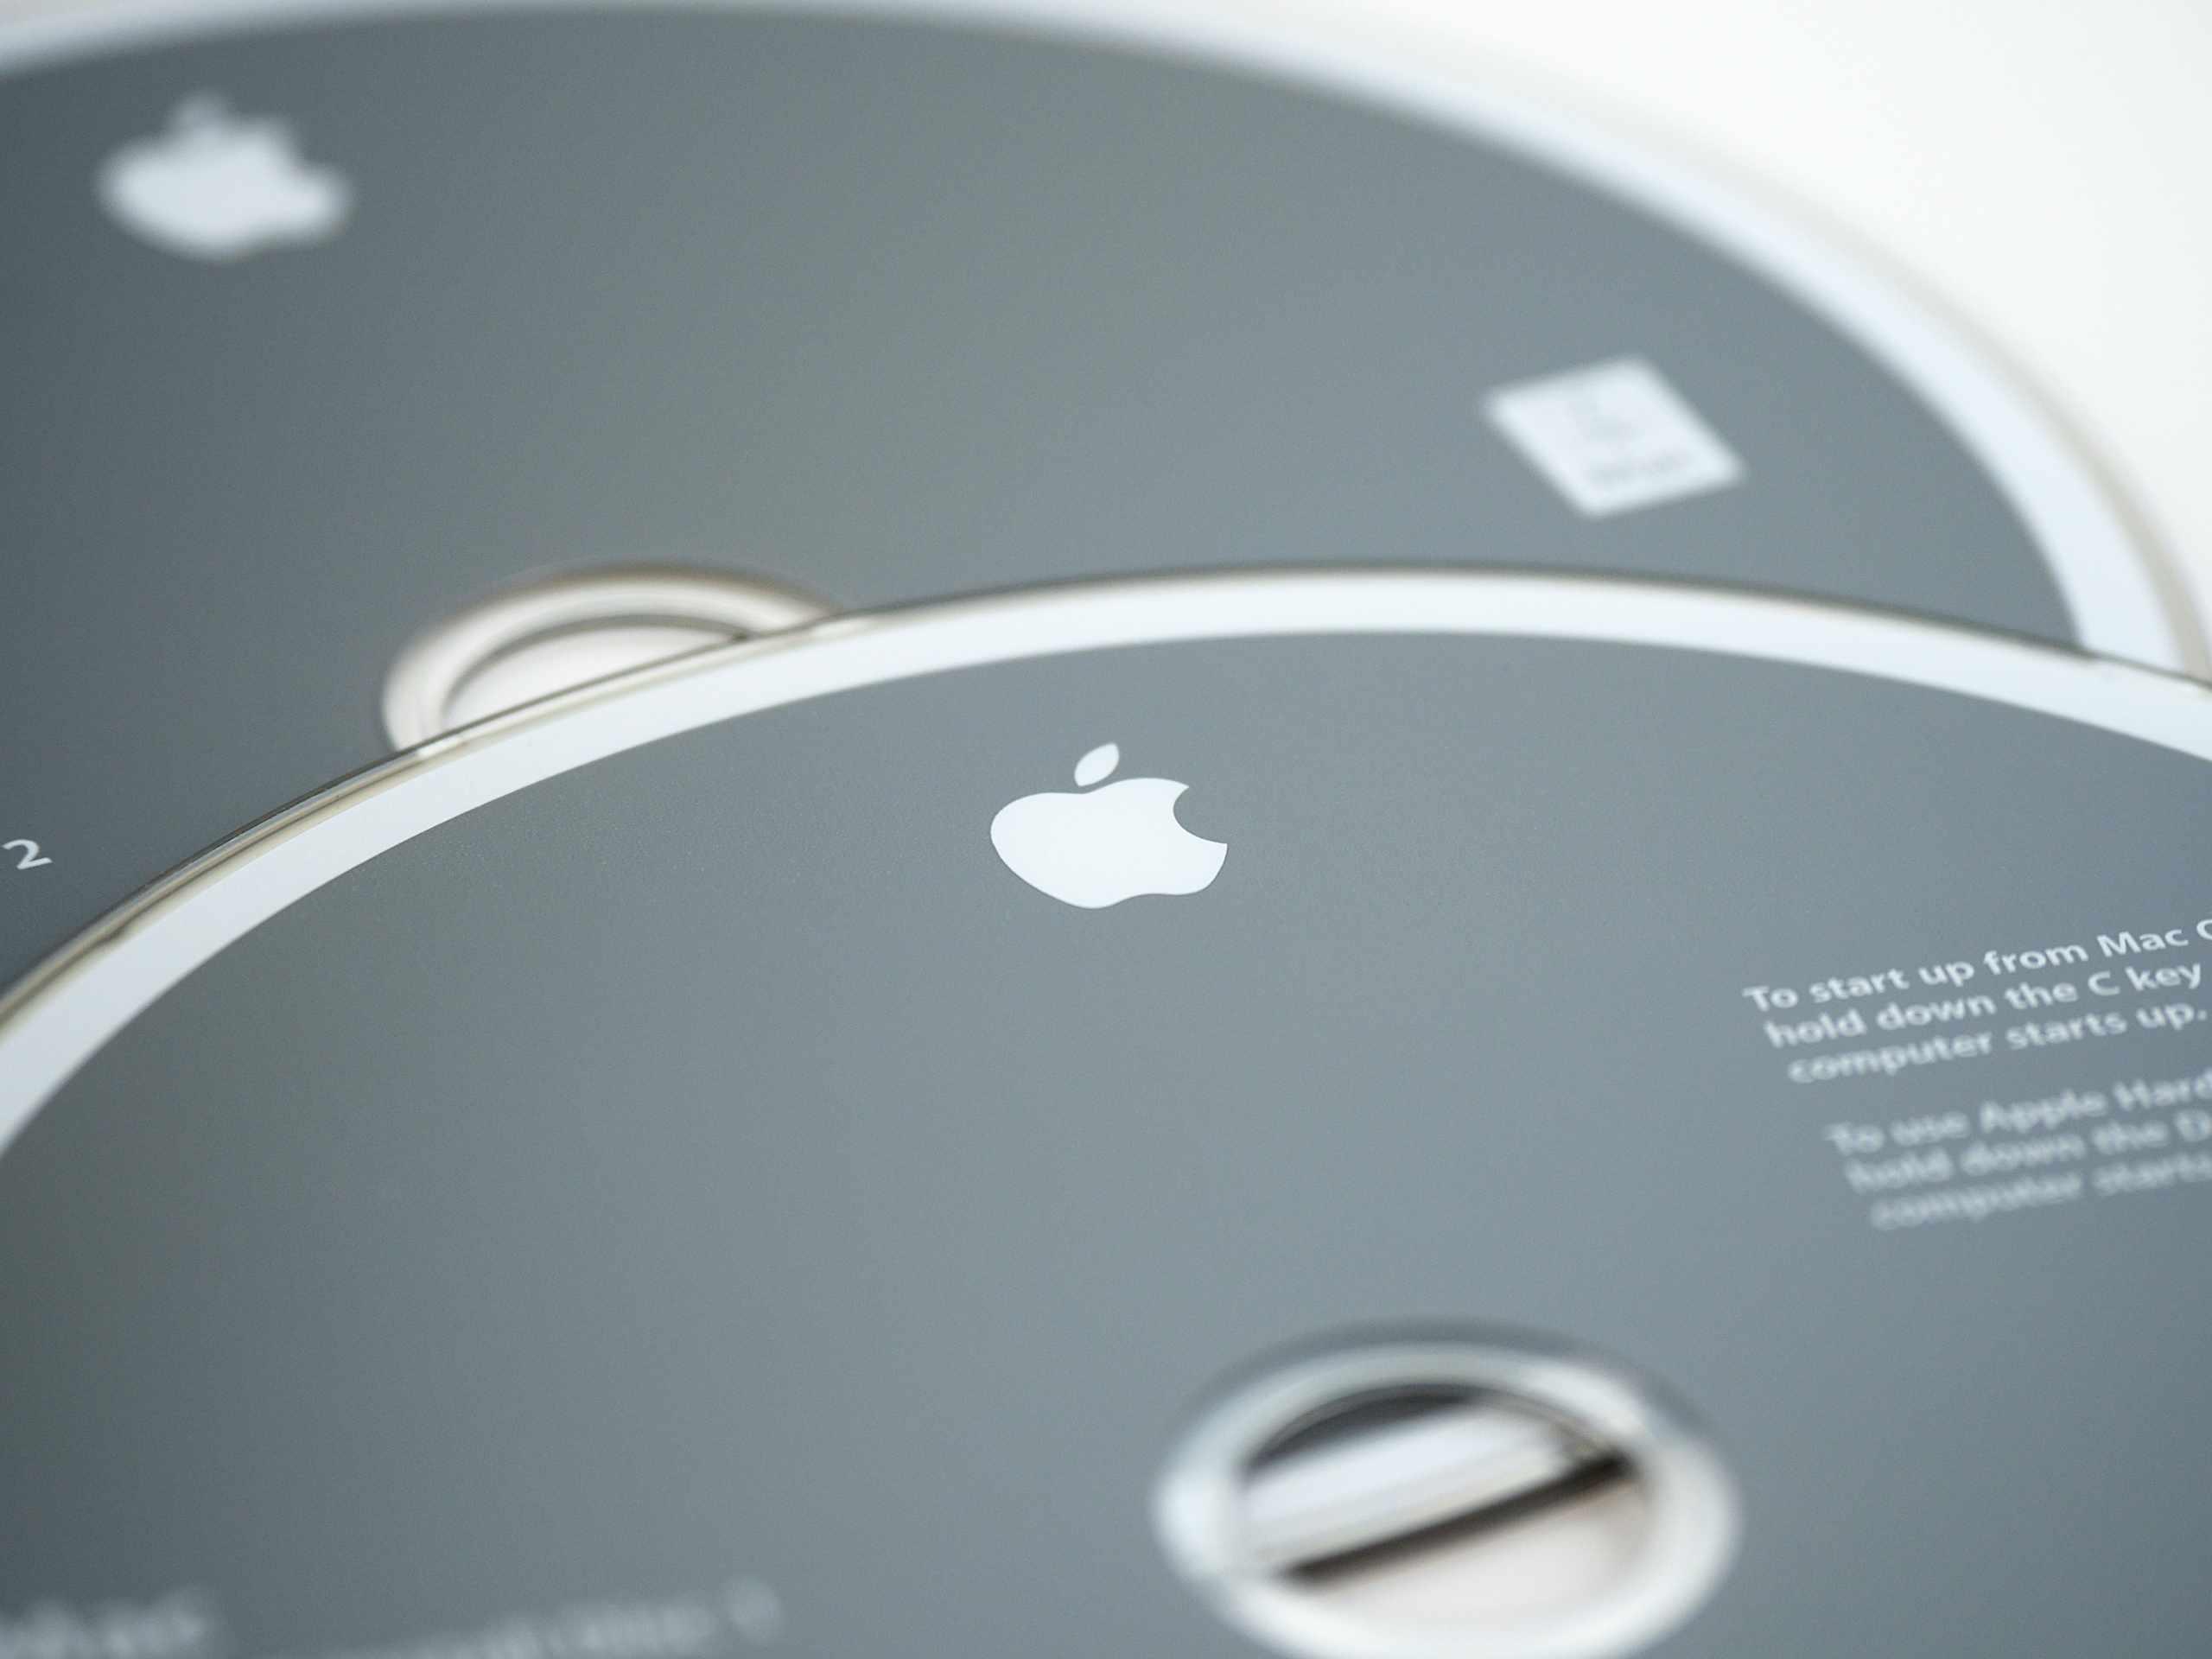 next Apple event